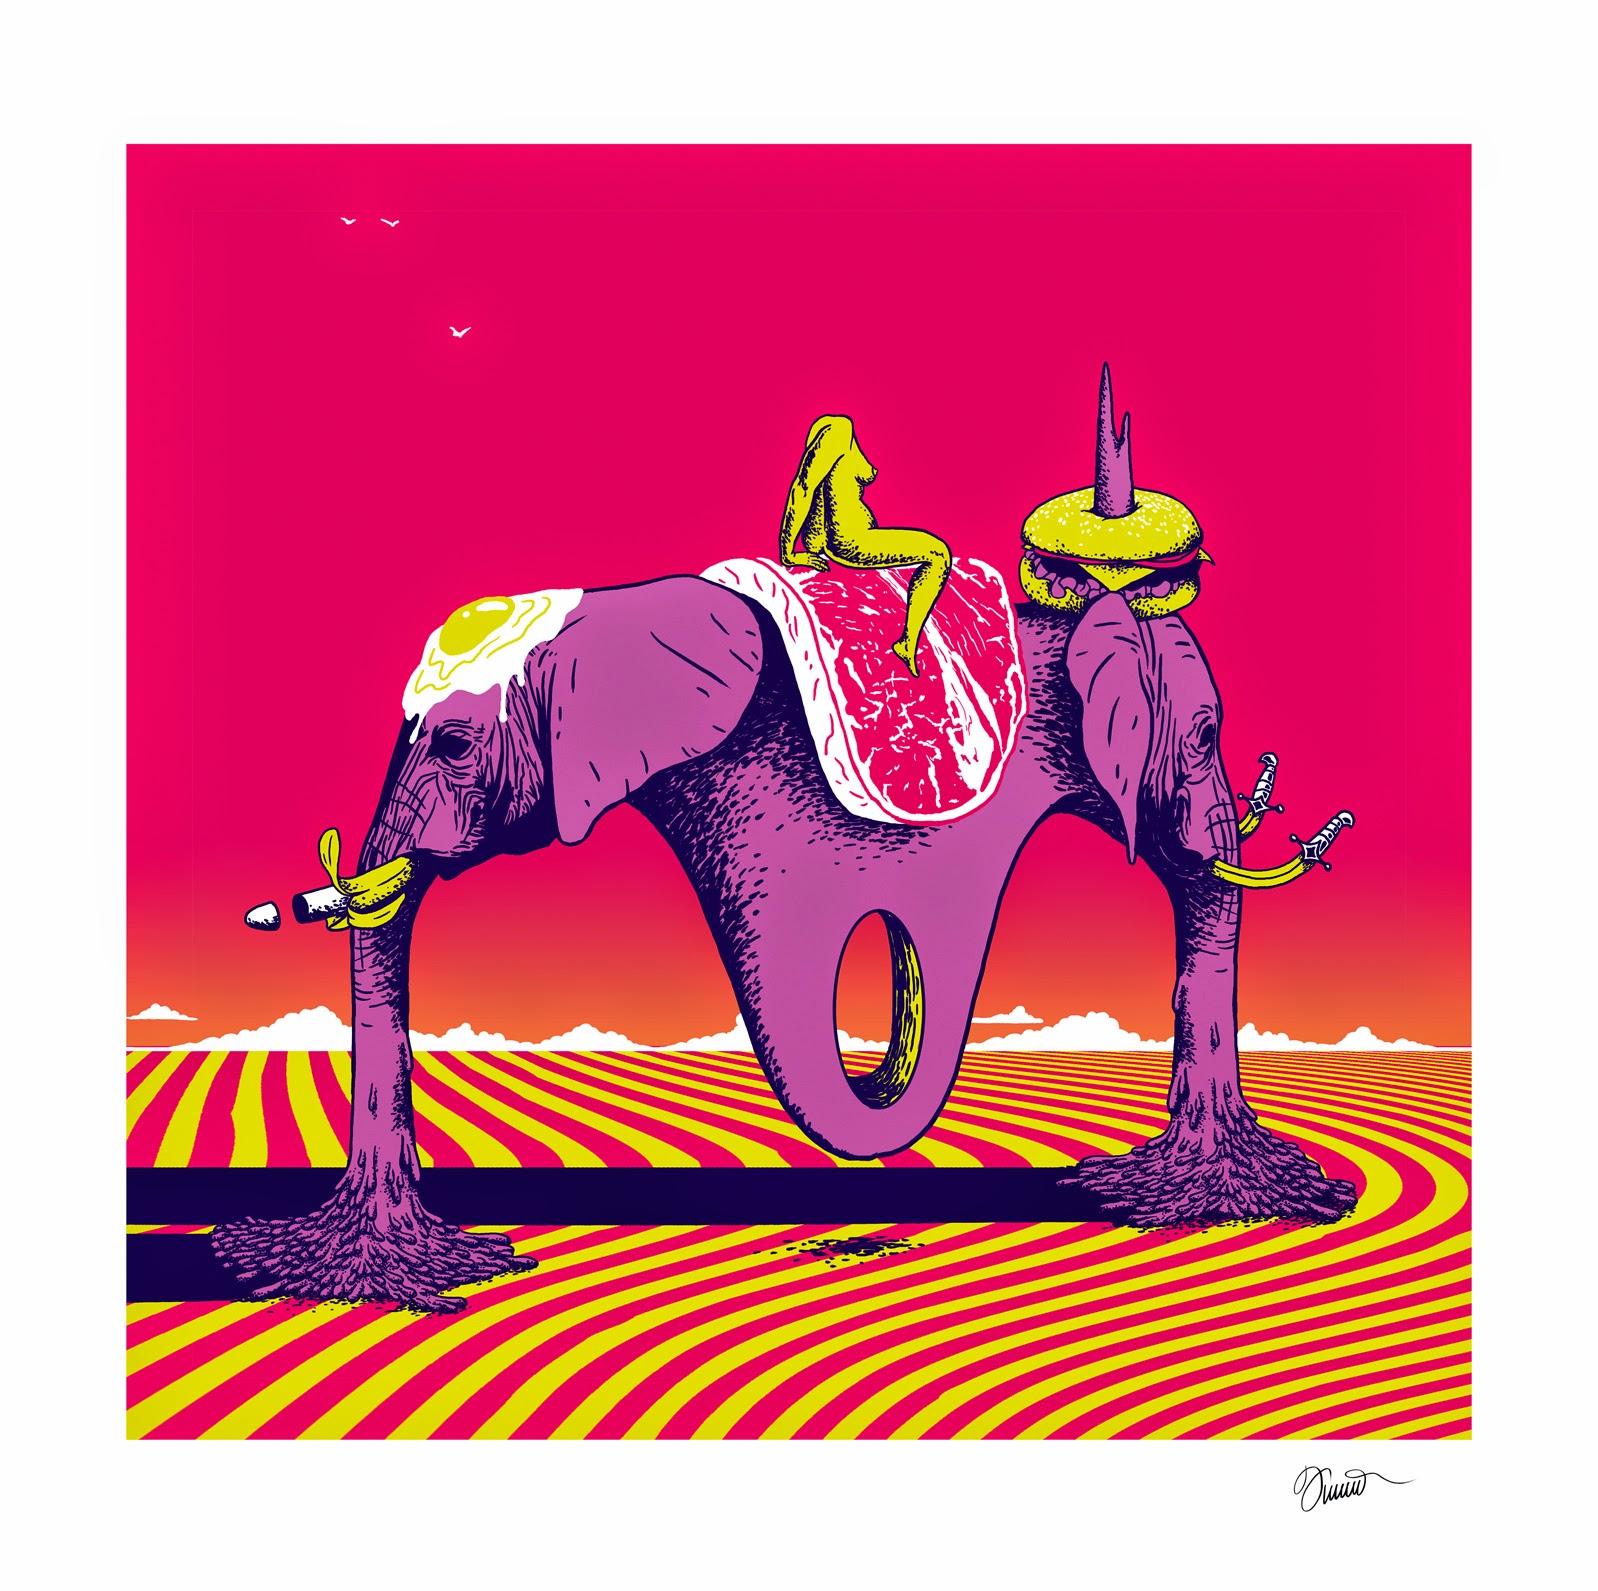 ©Andrey Flakonkishochki - Neon Ecstasy & Psychological Journeys. Ilustración | Illustration